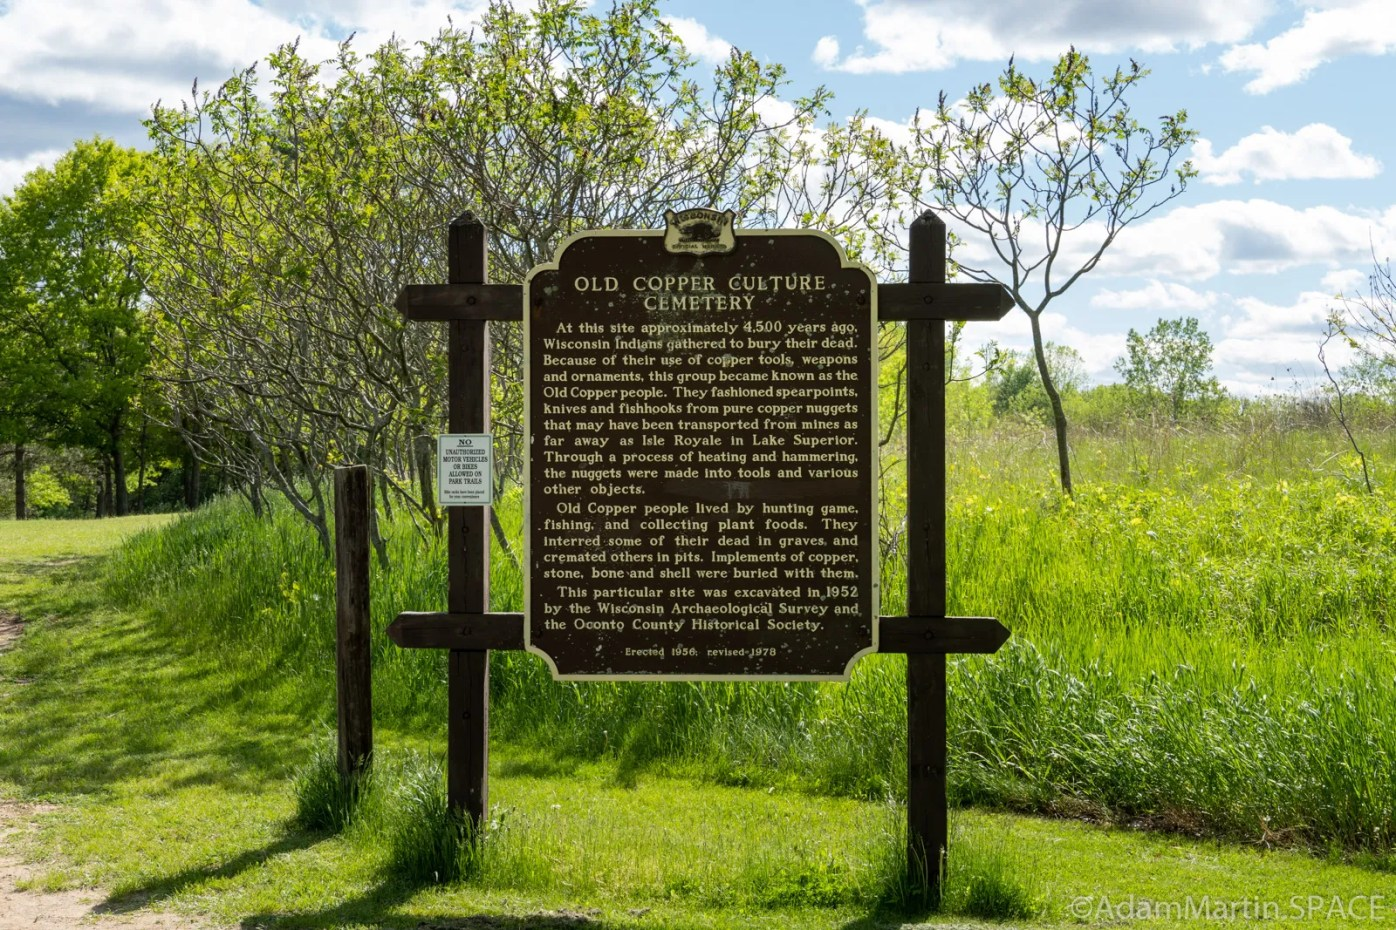 Copper Culture State Park - Old Copper Culture Cemetery sign